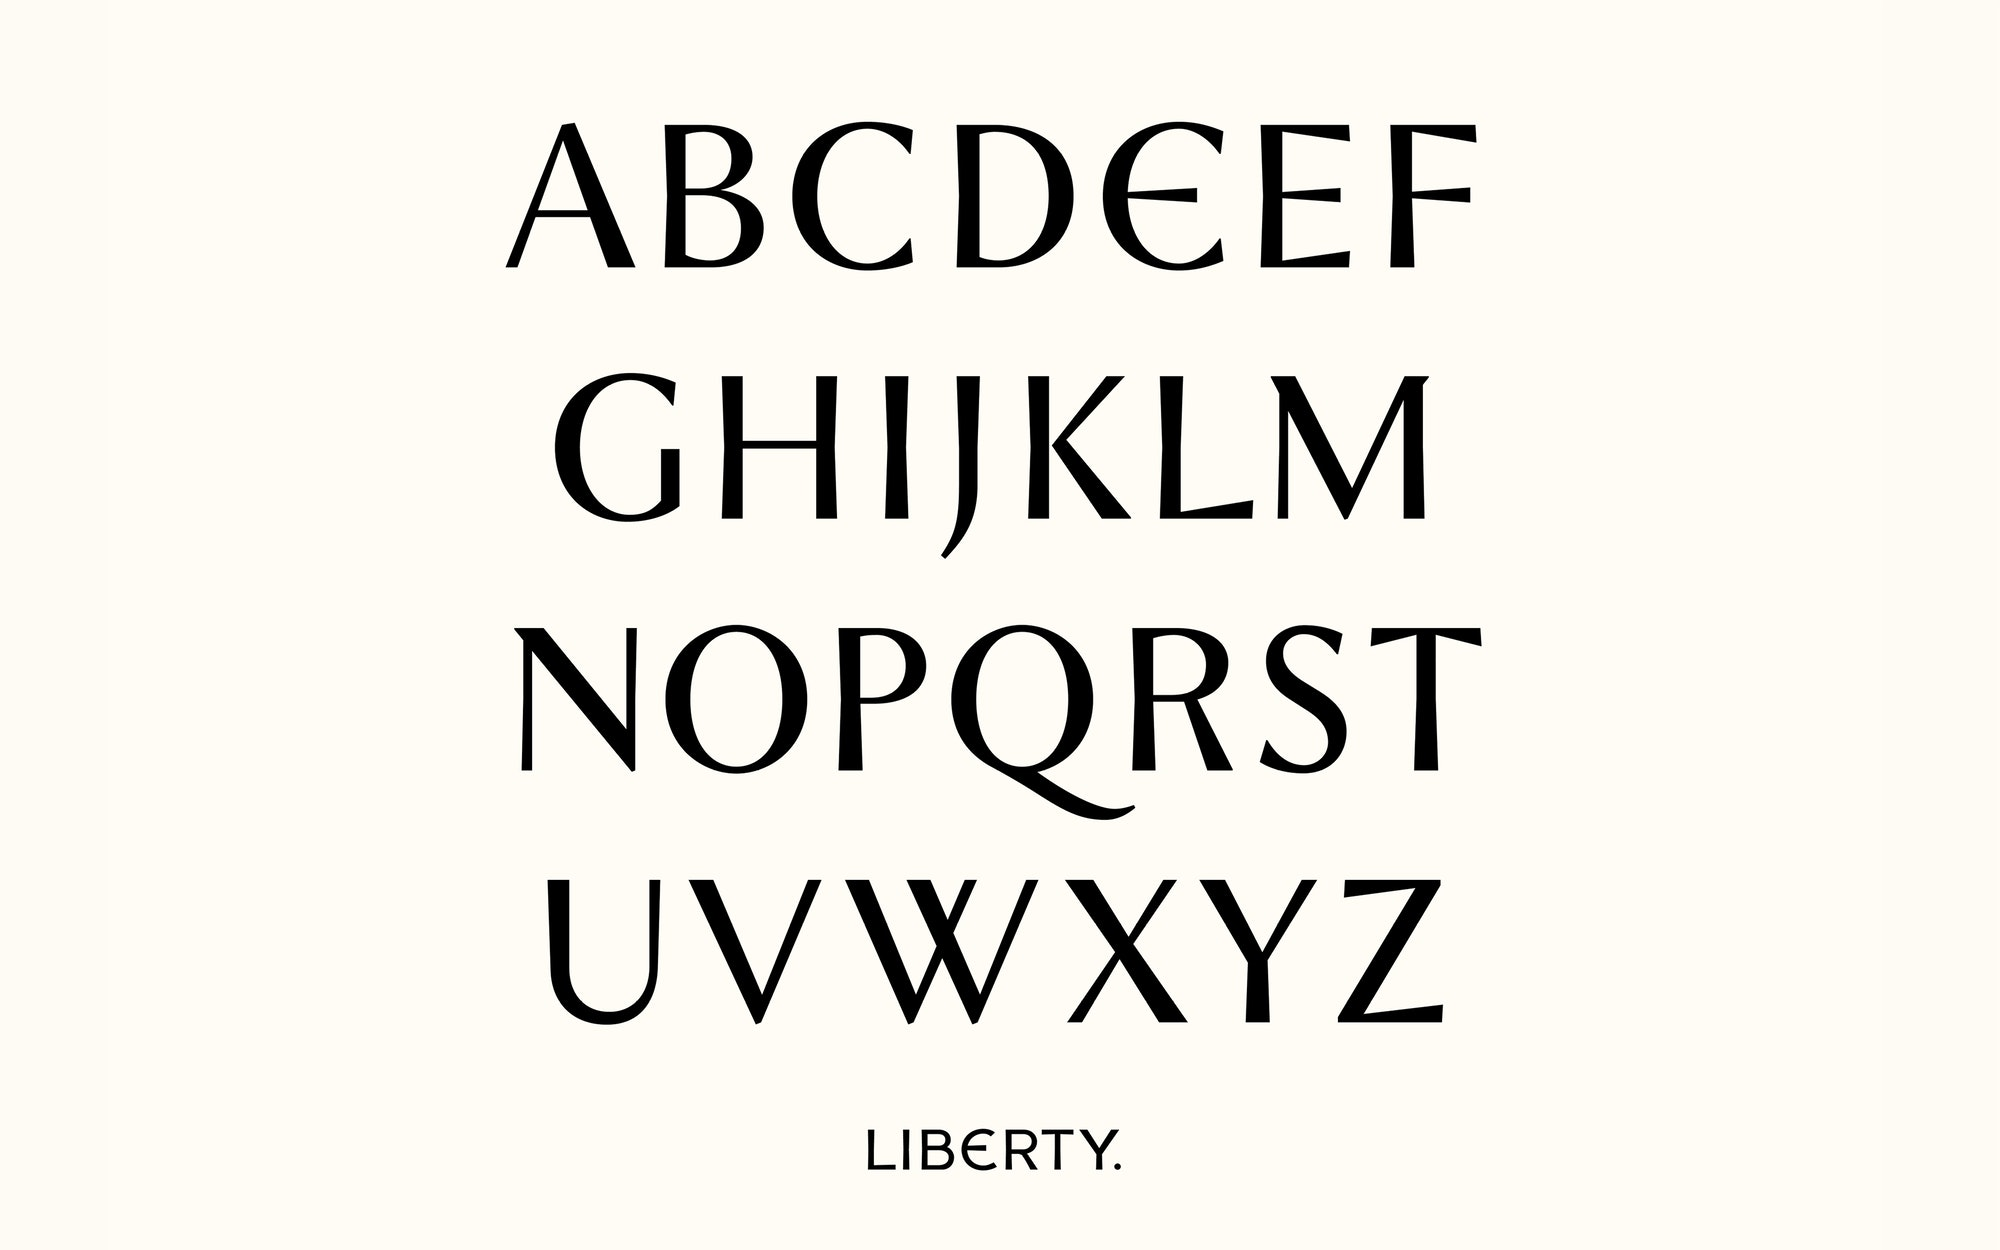 Liberty visual design by Pentagram